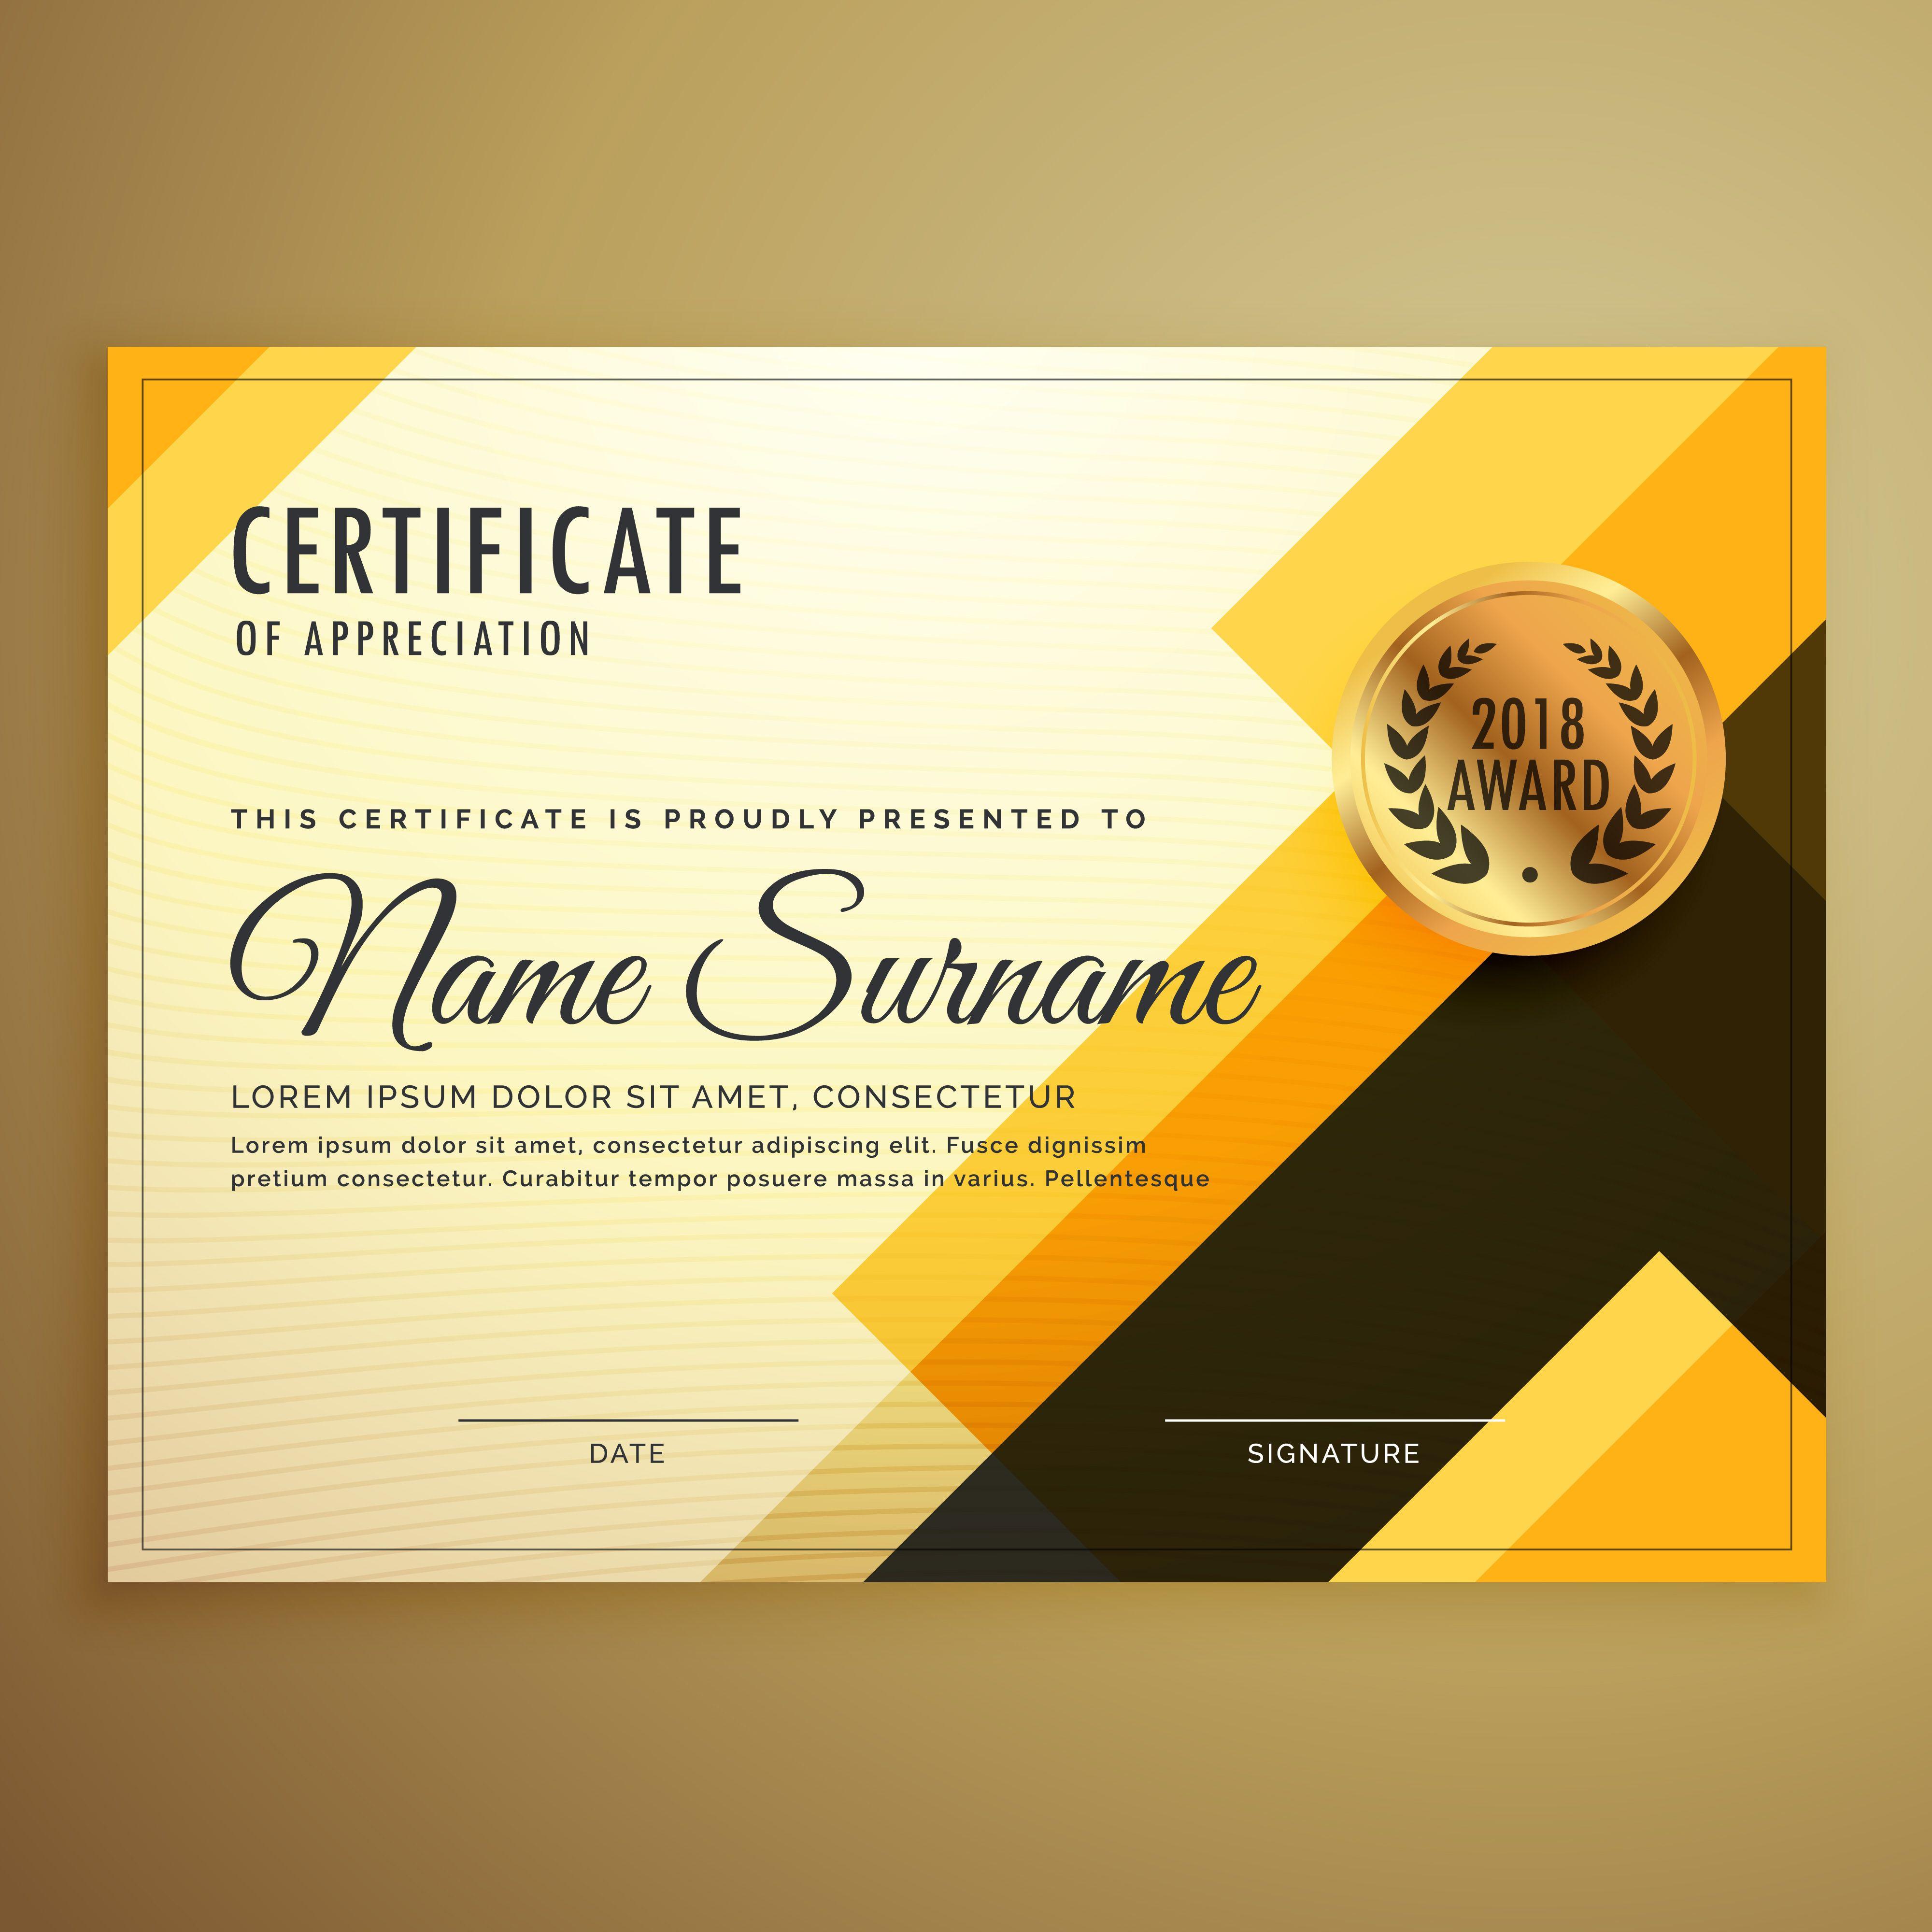 Modern Creative Certificate Design Template With Geometric Shape